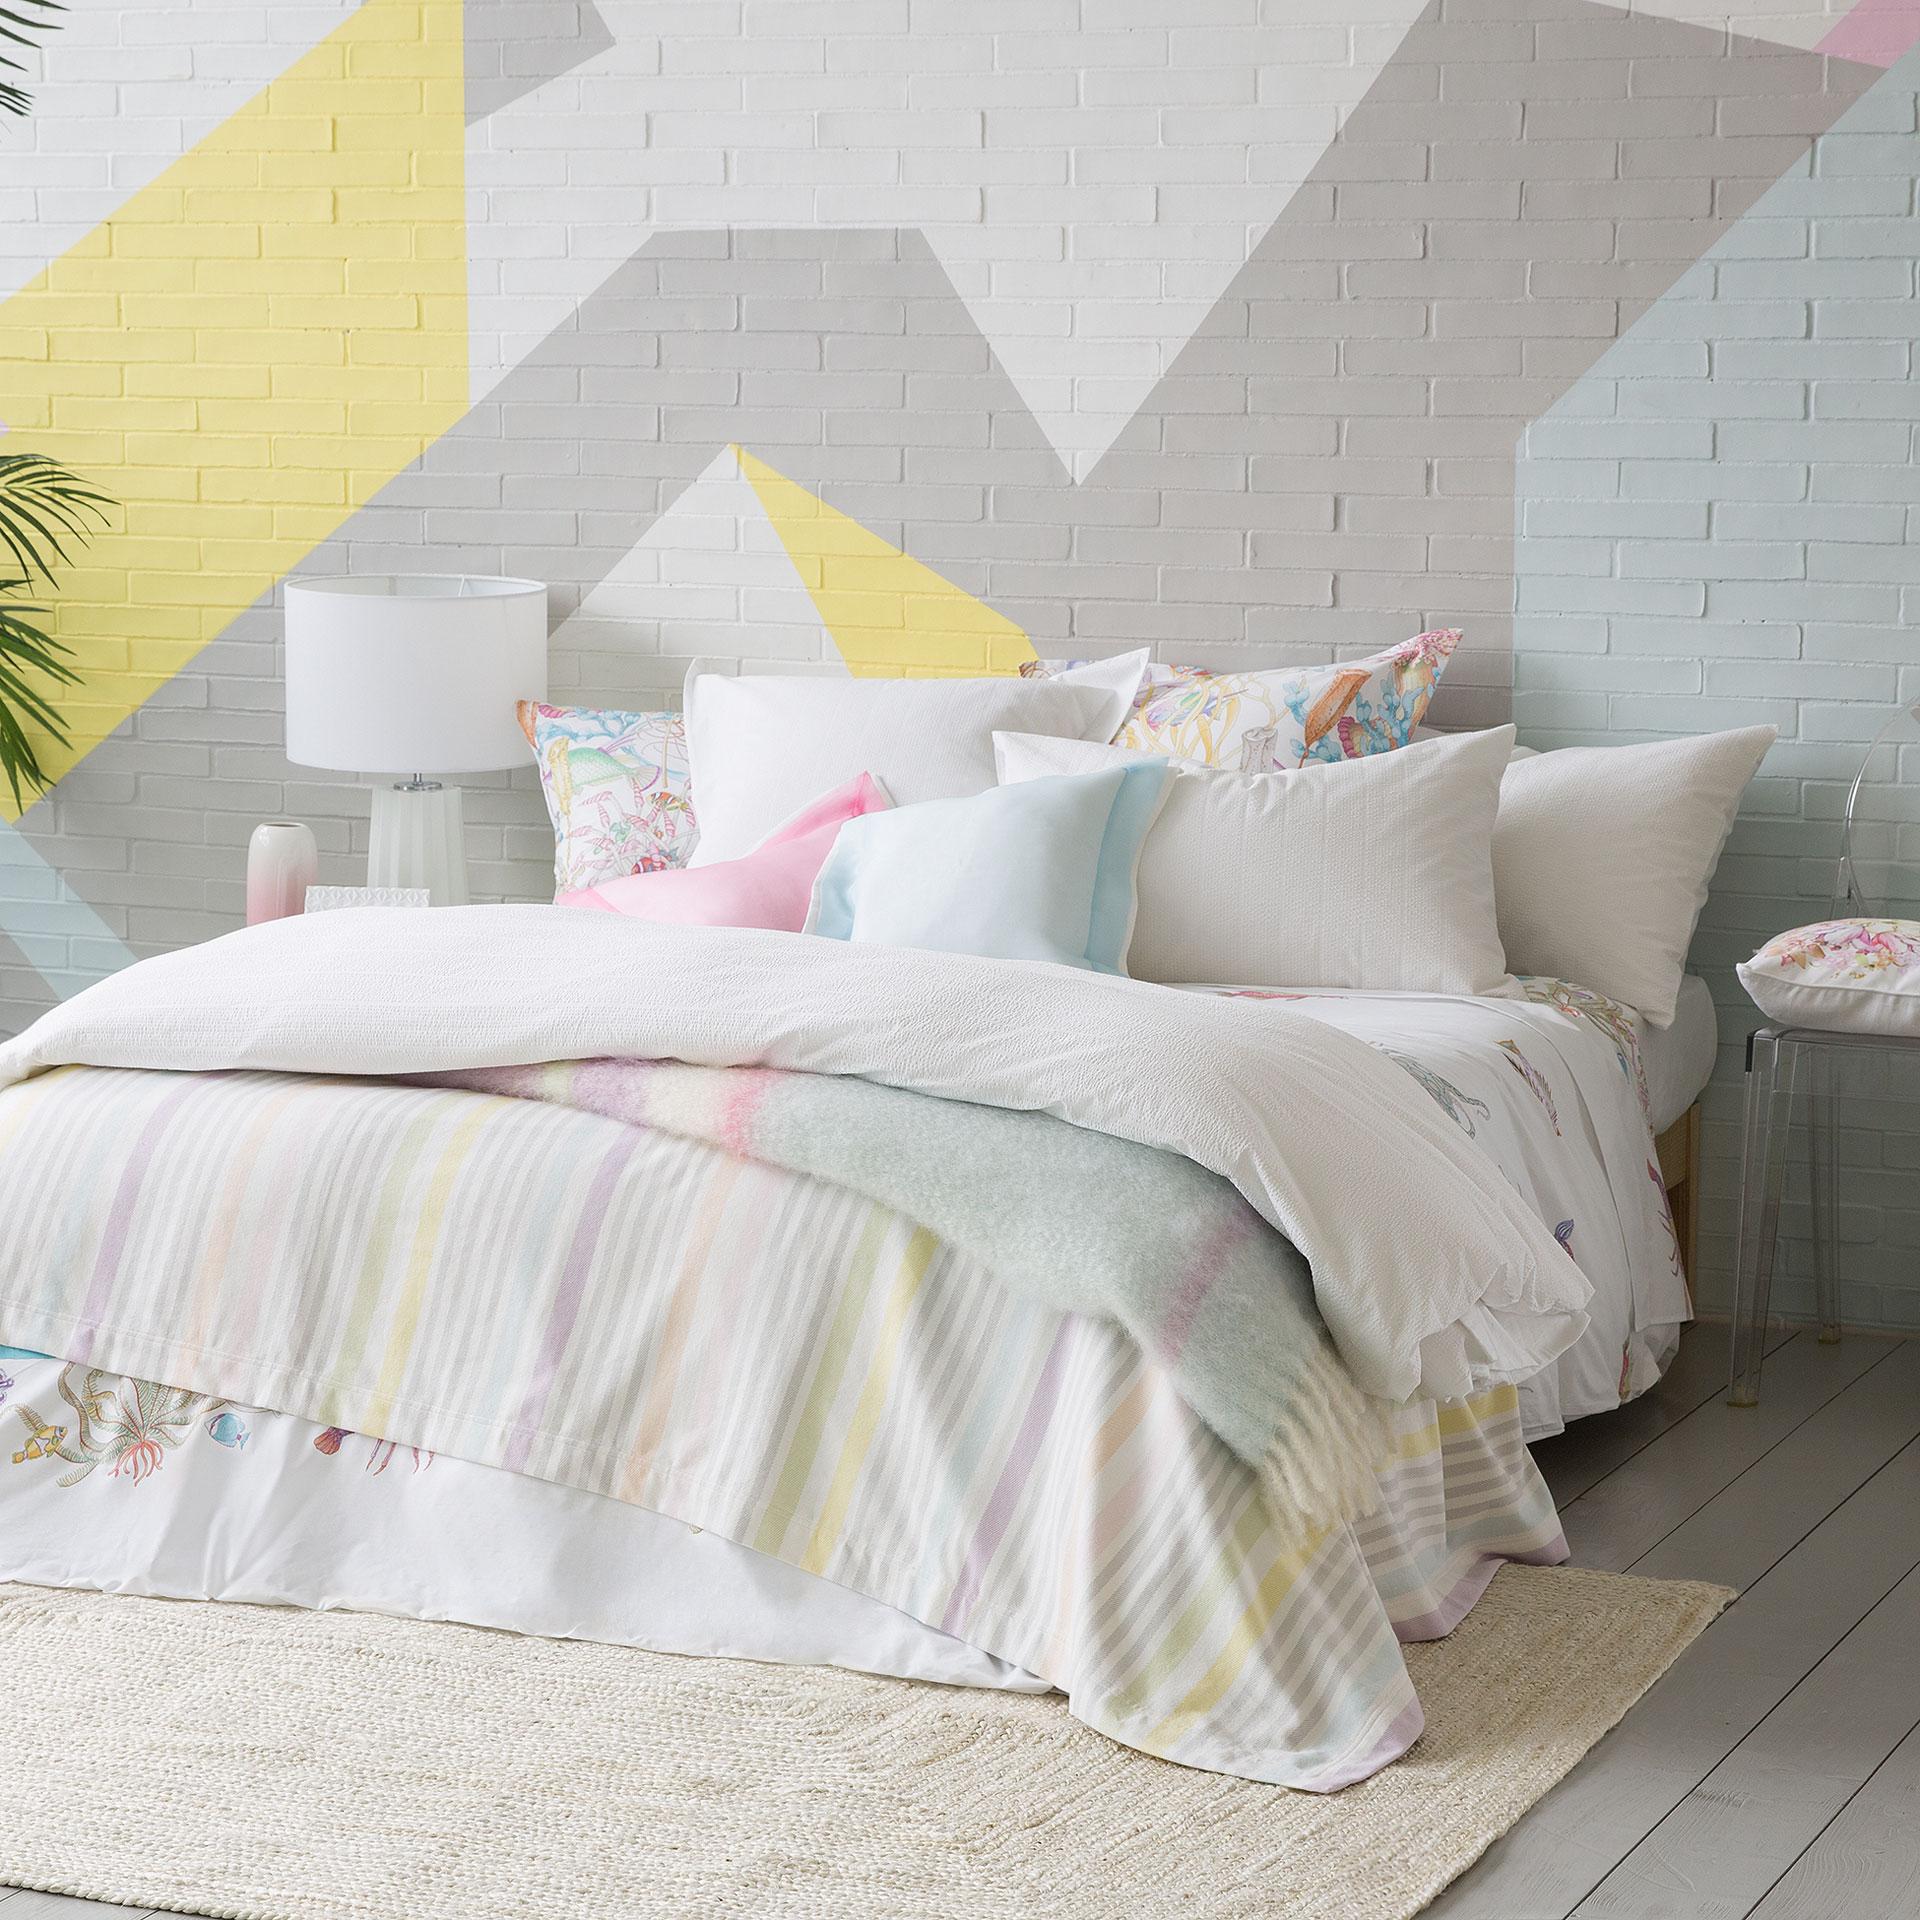 Zara Cotton Bedspread.jpg